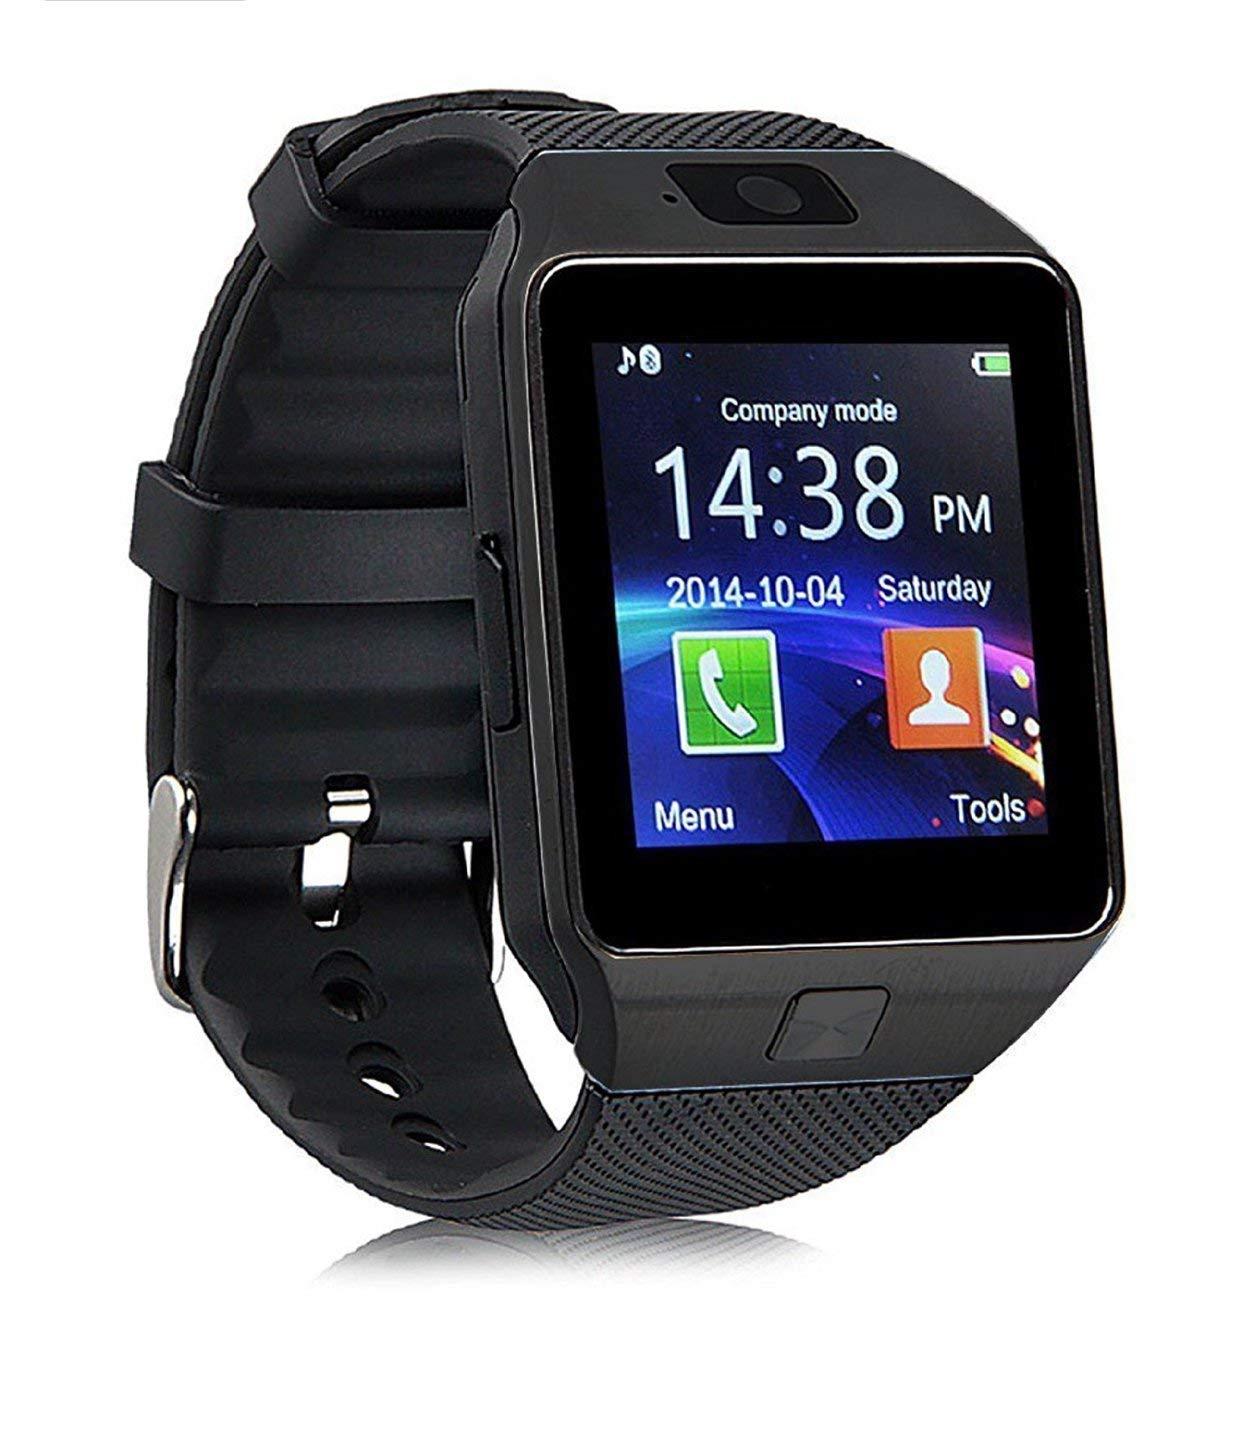 Smart Watch DZ New in Retail box/Call, Talk, Answer Calls, Messages/Email/Bluetooth/Camera/Pedometer/Music Player/Calendar/Alarm Clock/Sim Slot/(Black)